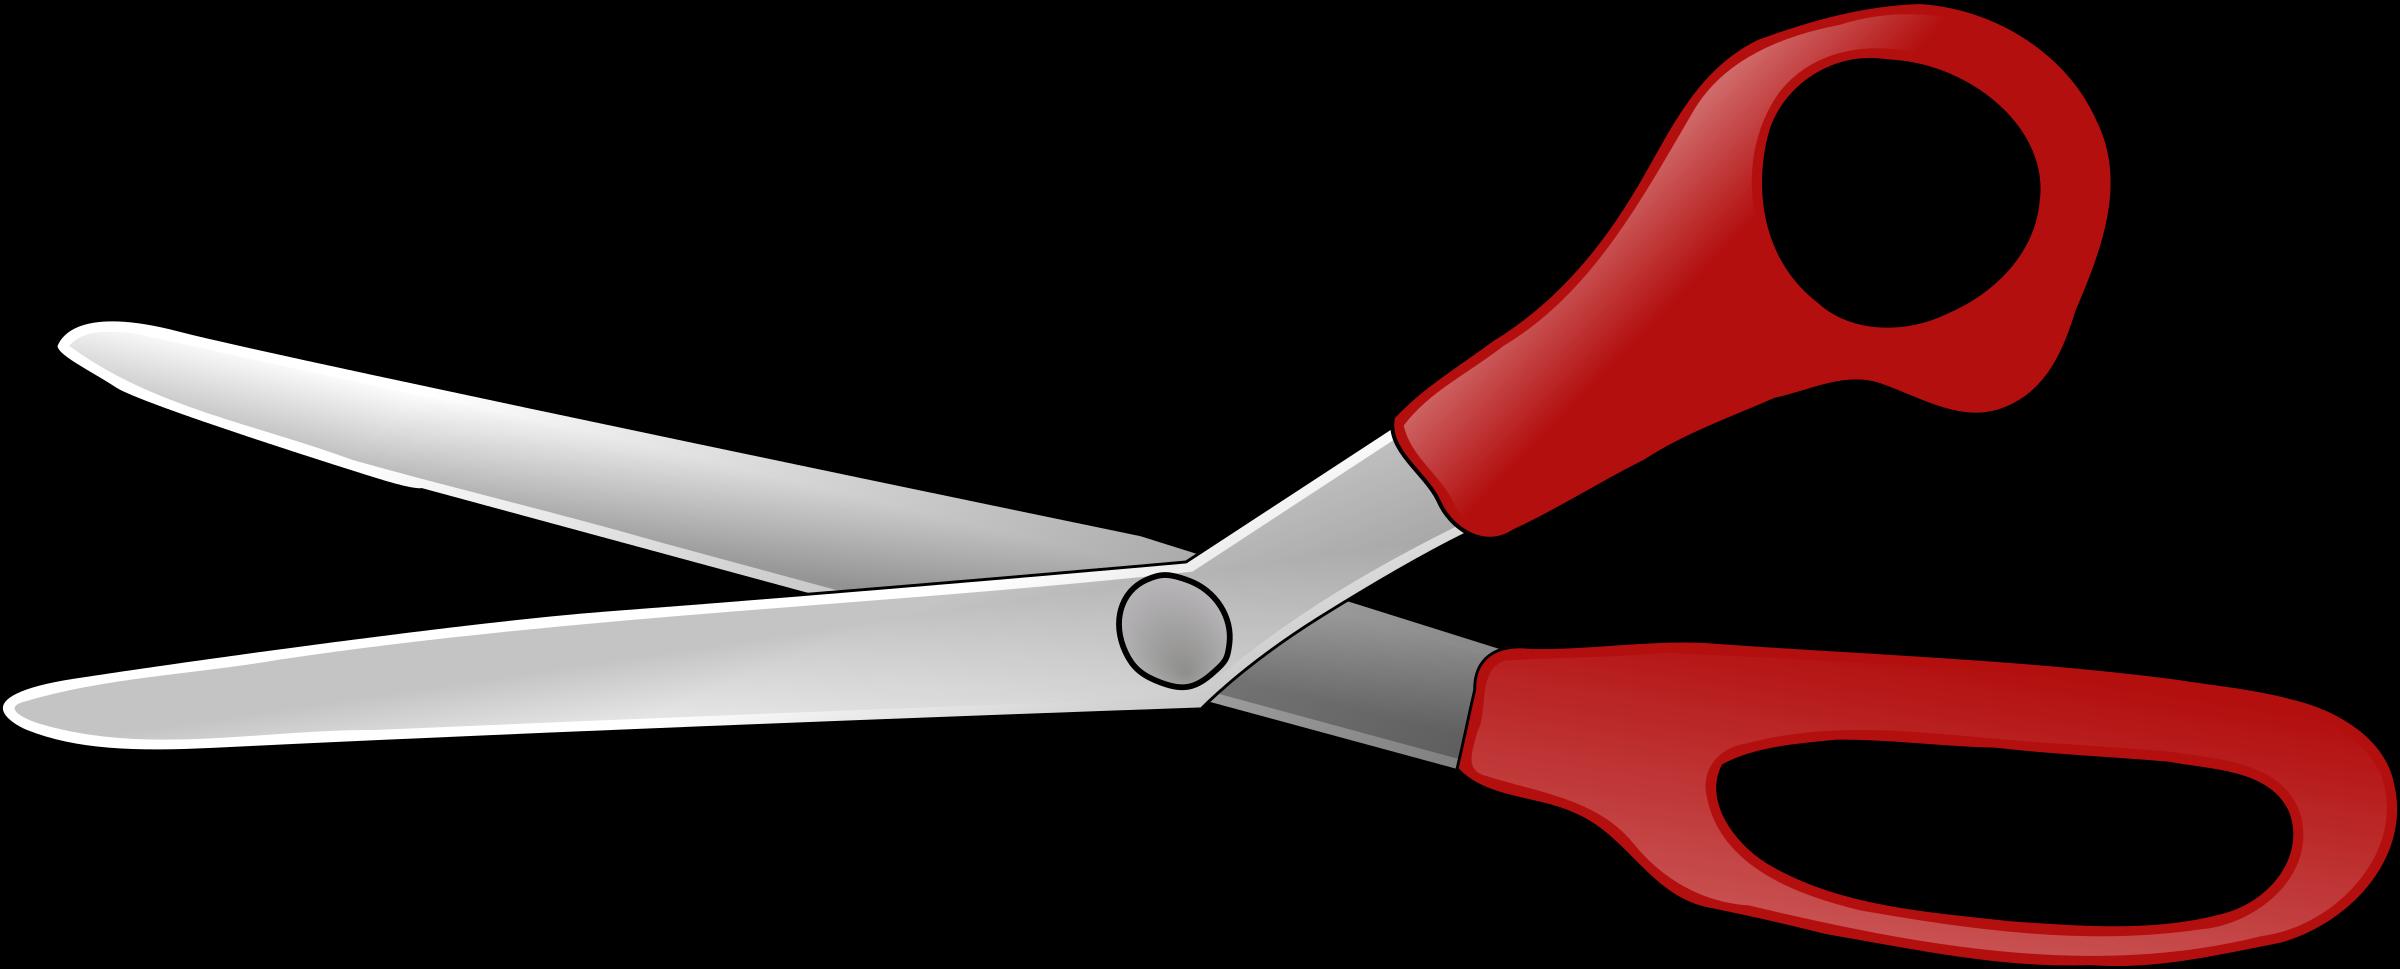 Clipart scissors gluestick. Png of a pair